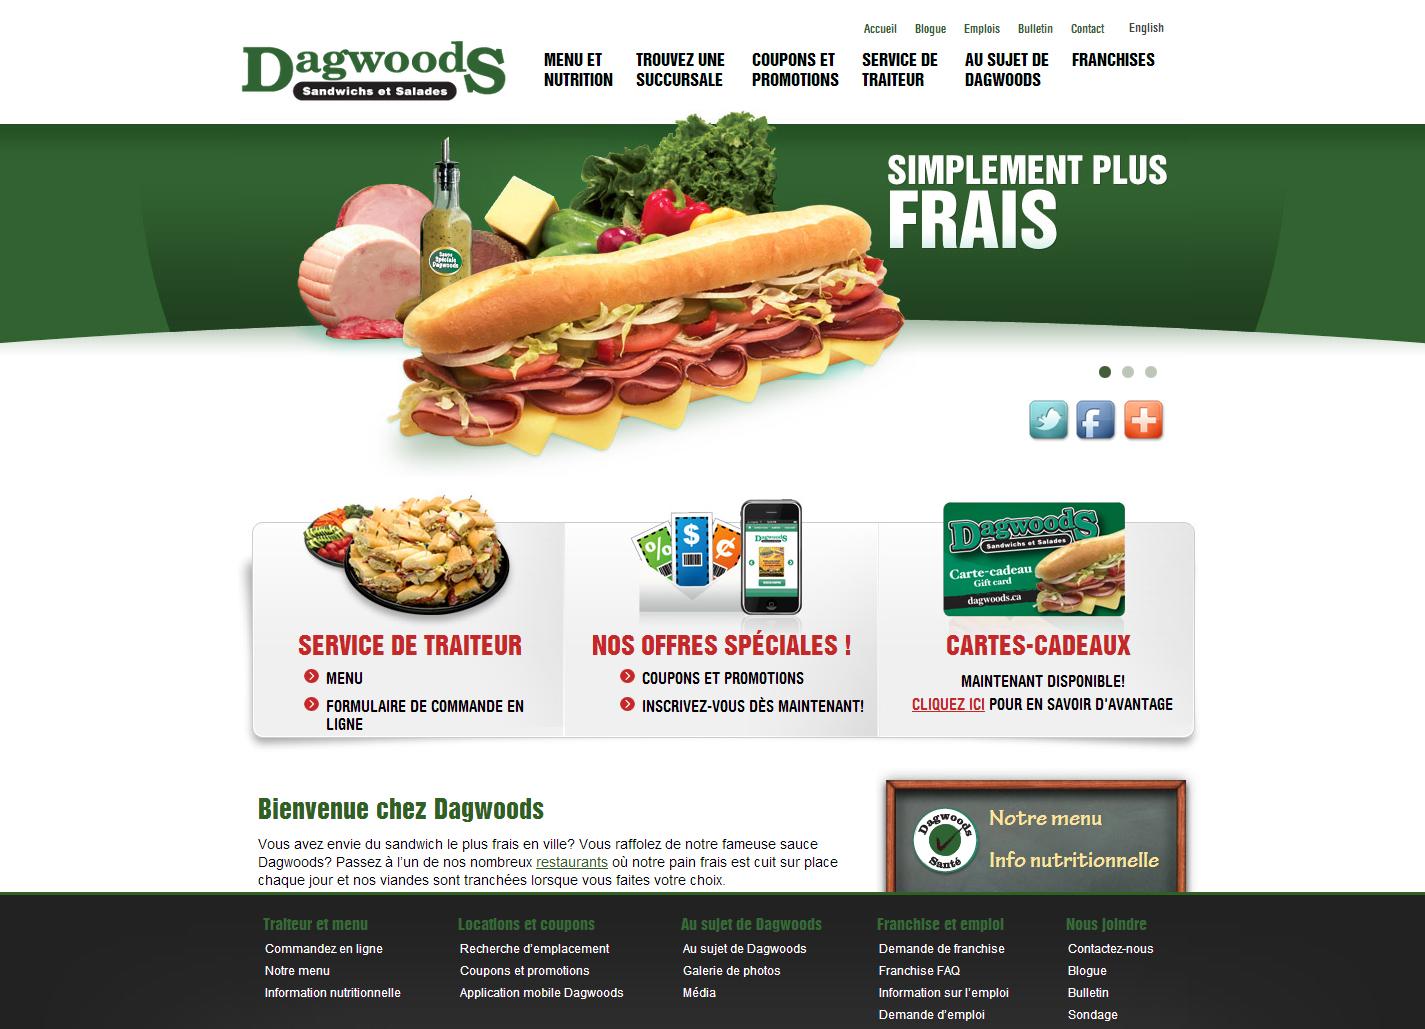 Dagwoods